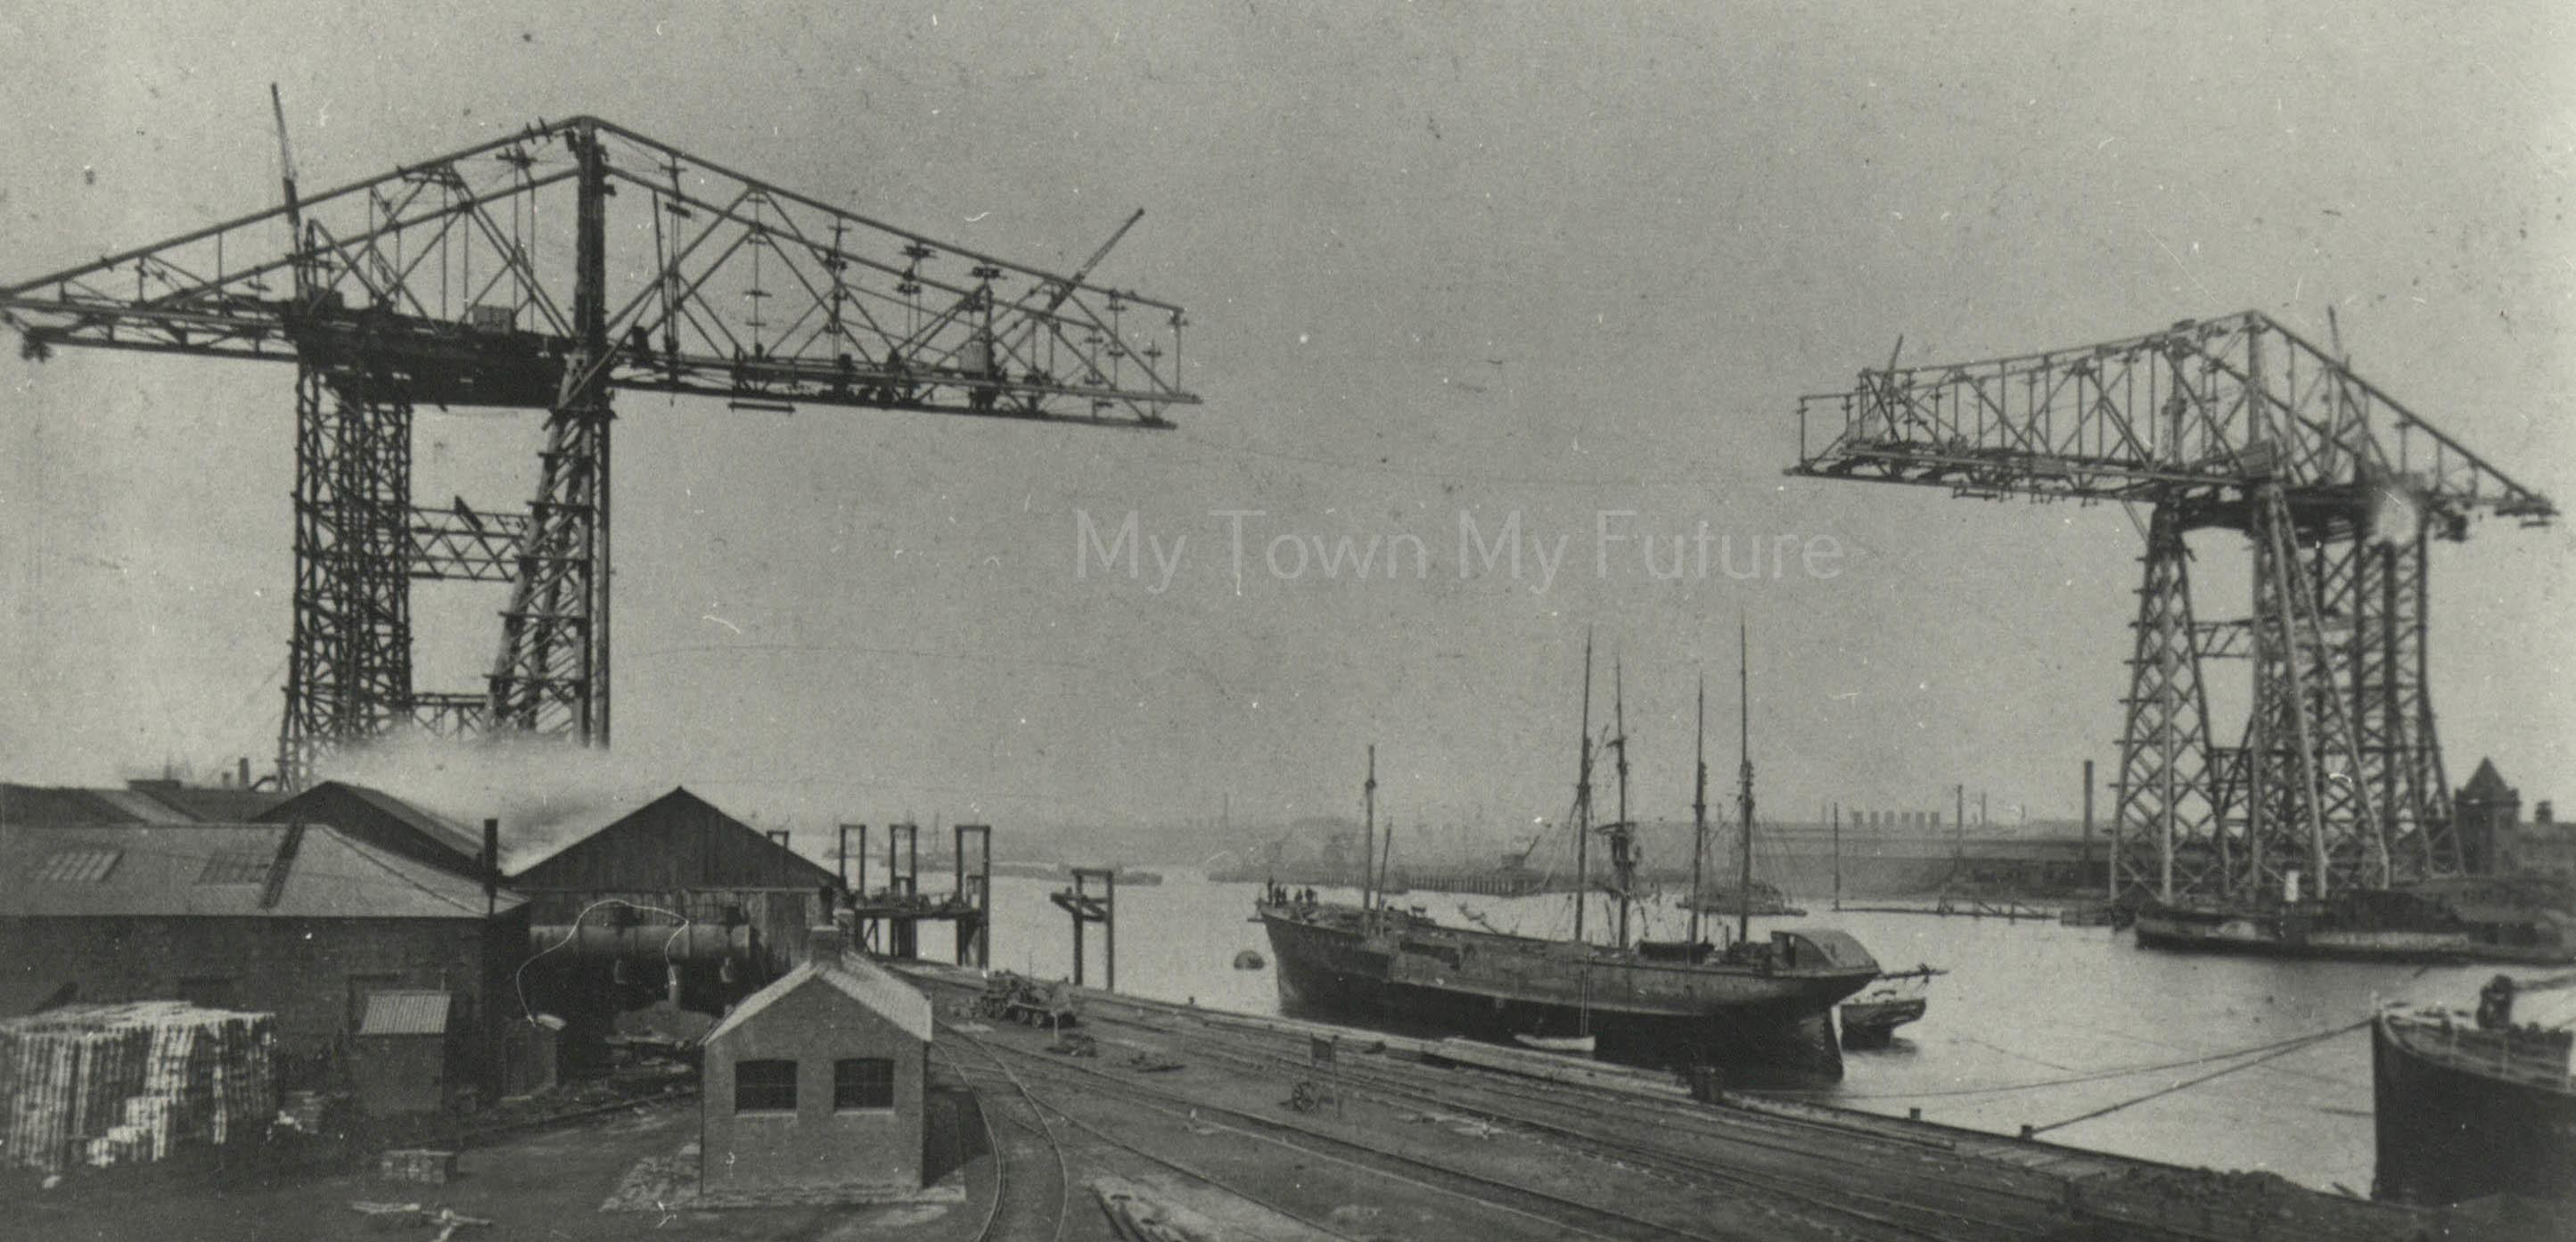 Transporter Bridge - Under Construction, 1911, Department of Planning - Cleveland County Council